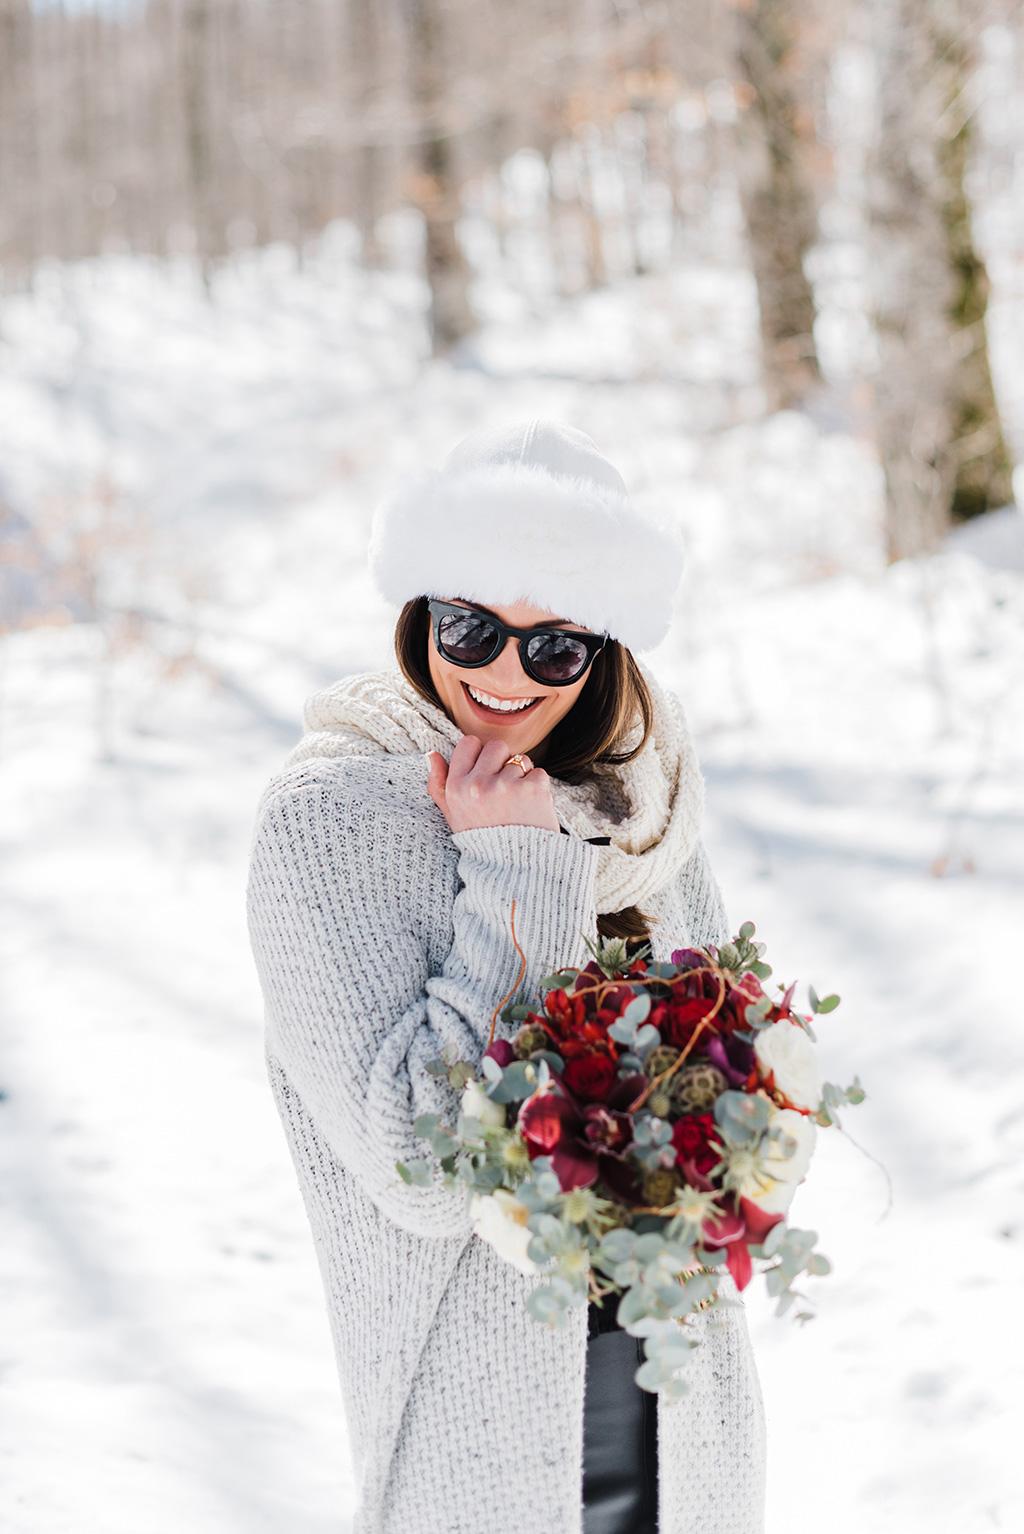 Prewedding φωτογράφιση στα χιόνια, μια υπέροχη εμπειρία για το ζευγάρι, George Kostopoulos Fine Art Wedding Photography